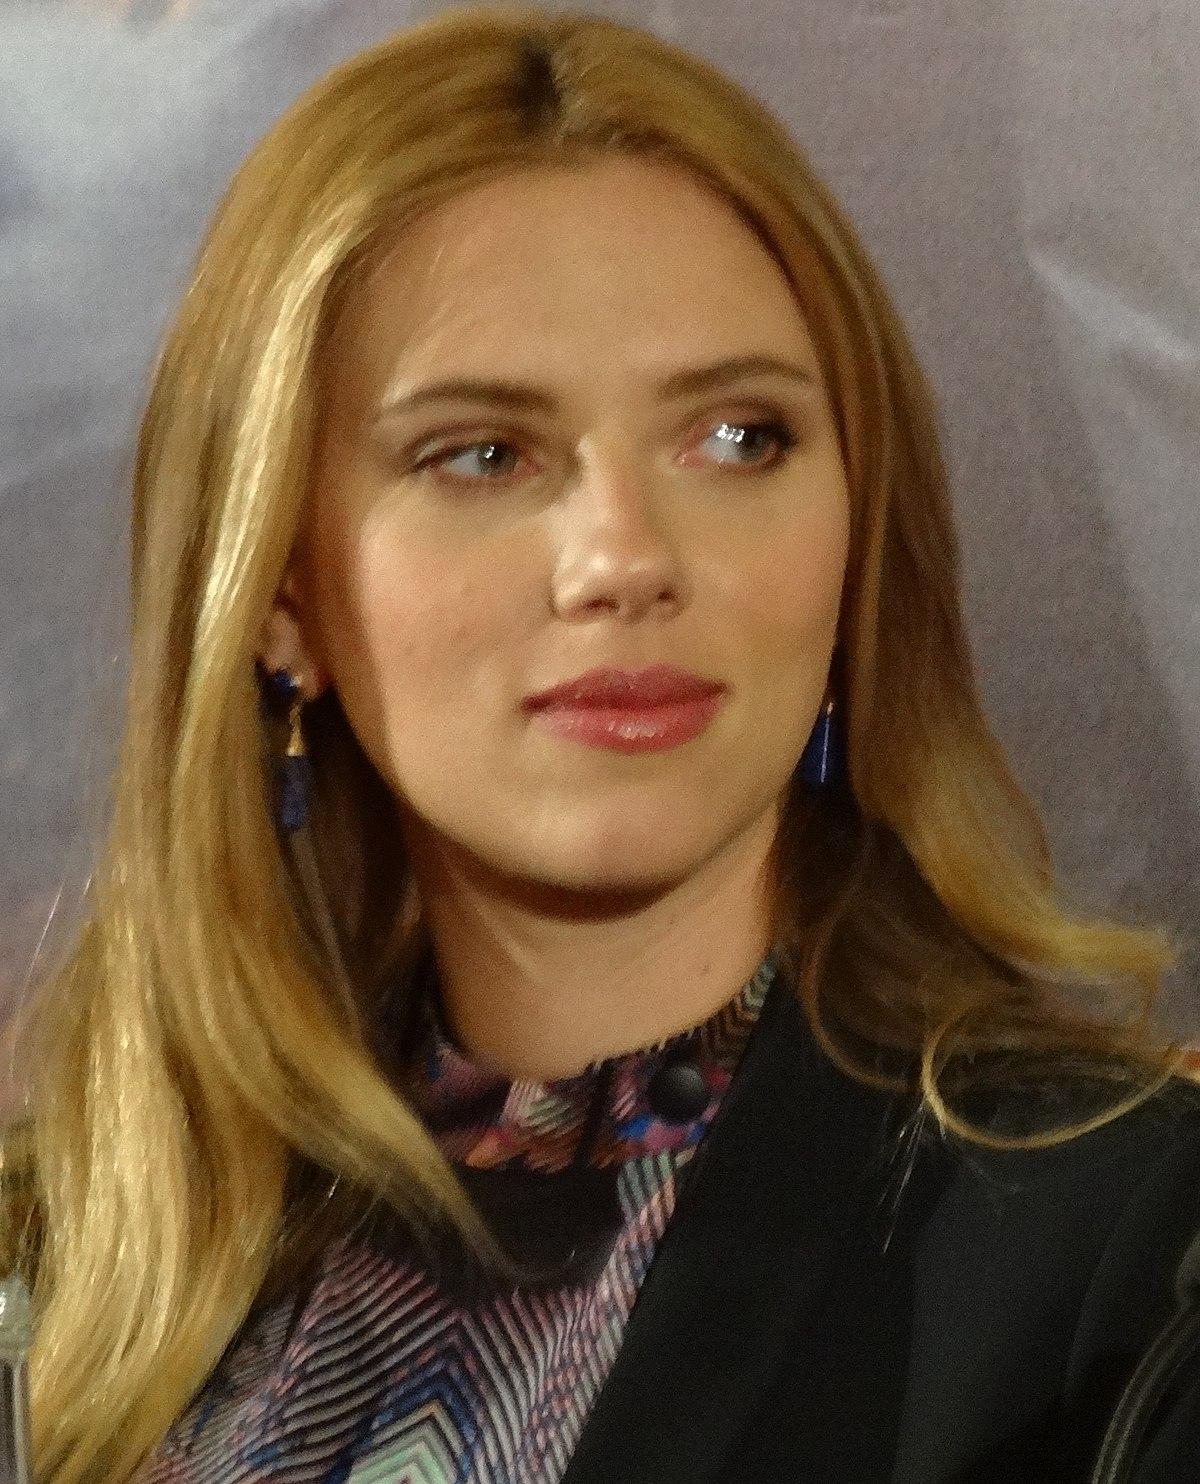 Scarlett Johansson - Wikipedia Scarlett Johansson